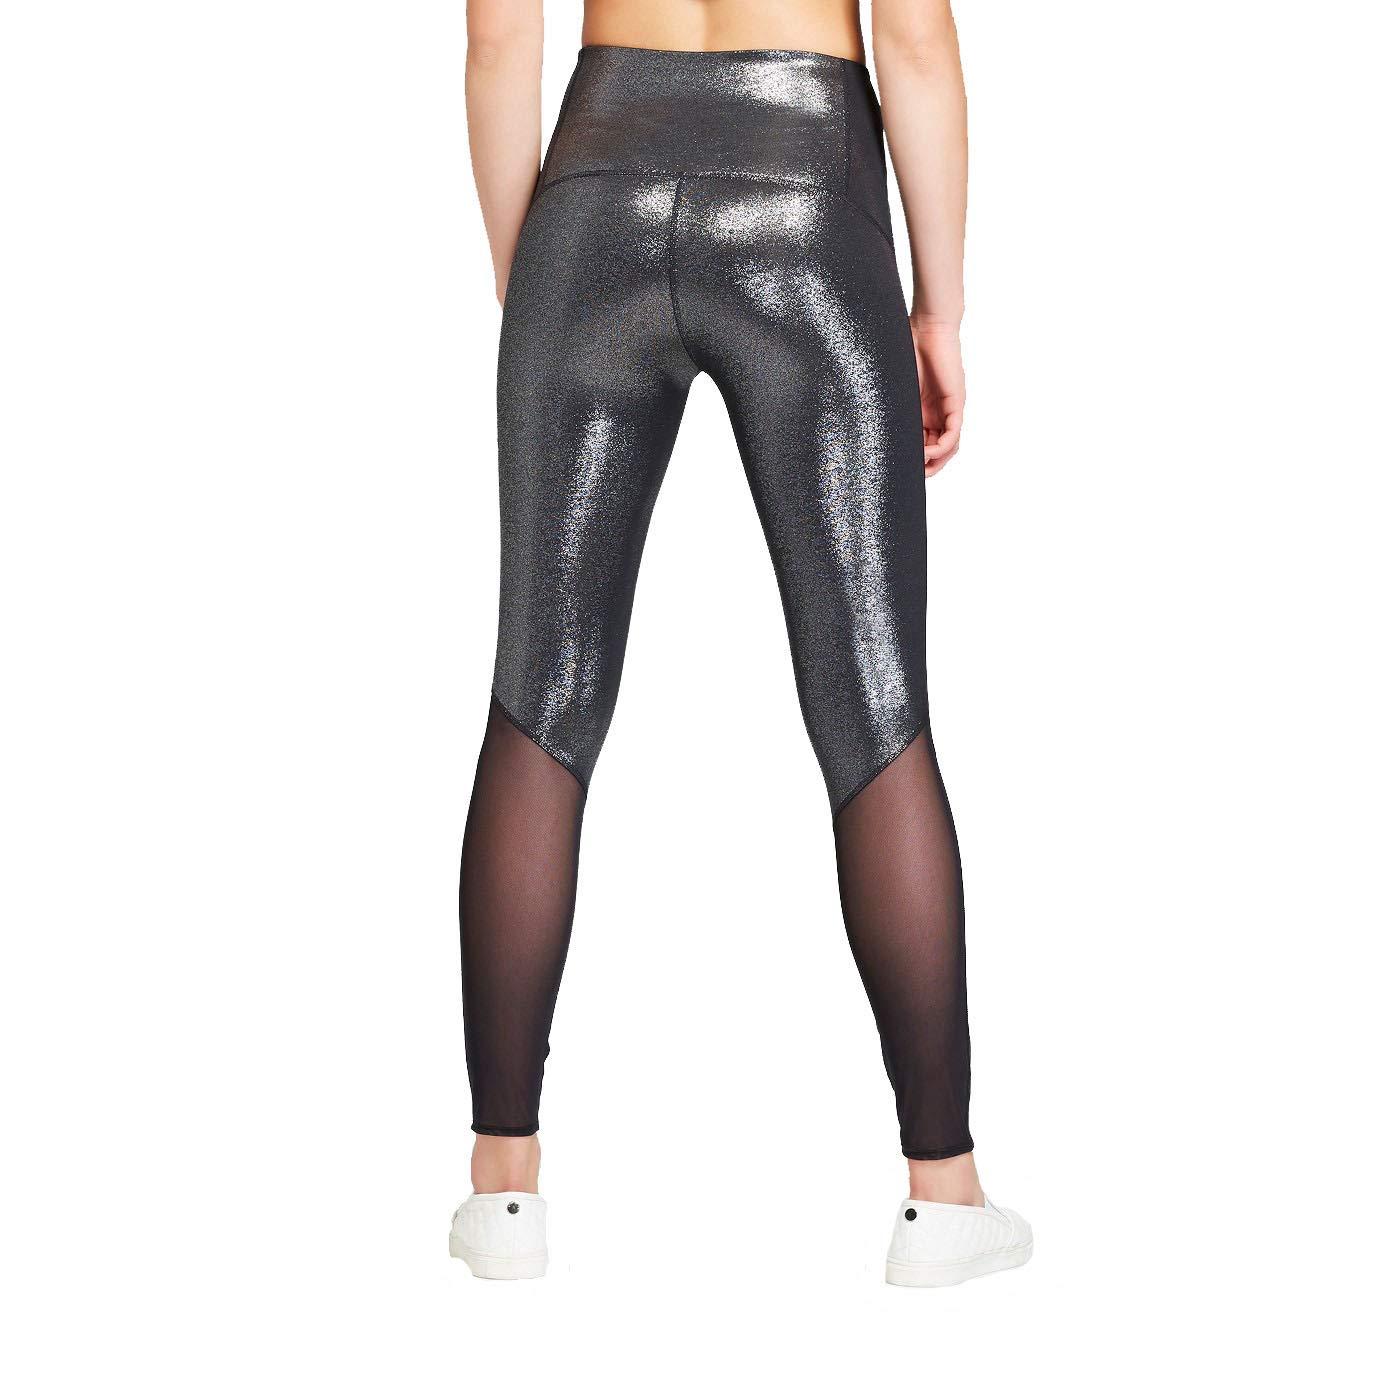 186cf7640e870b JoyLab Women's High-Waisted 7/8 Shine Leggings Black at Amazon Women's  Clothing store: